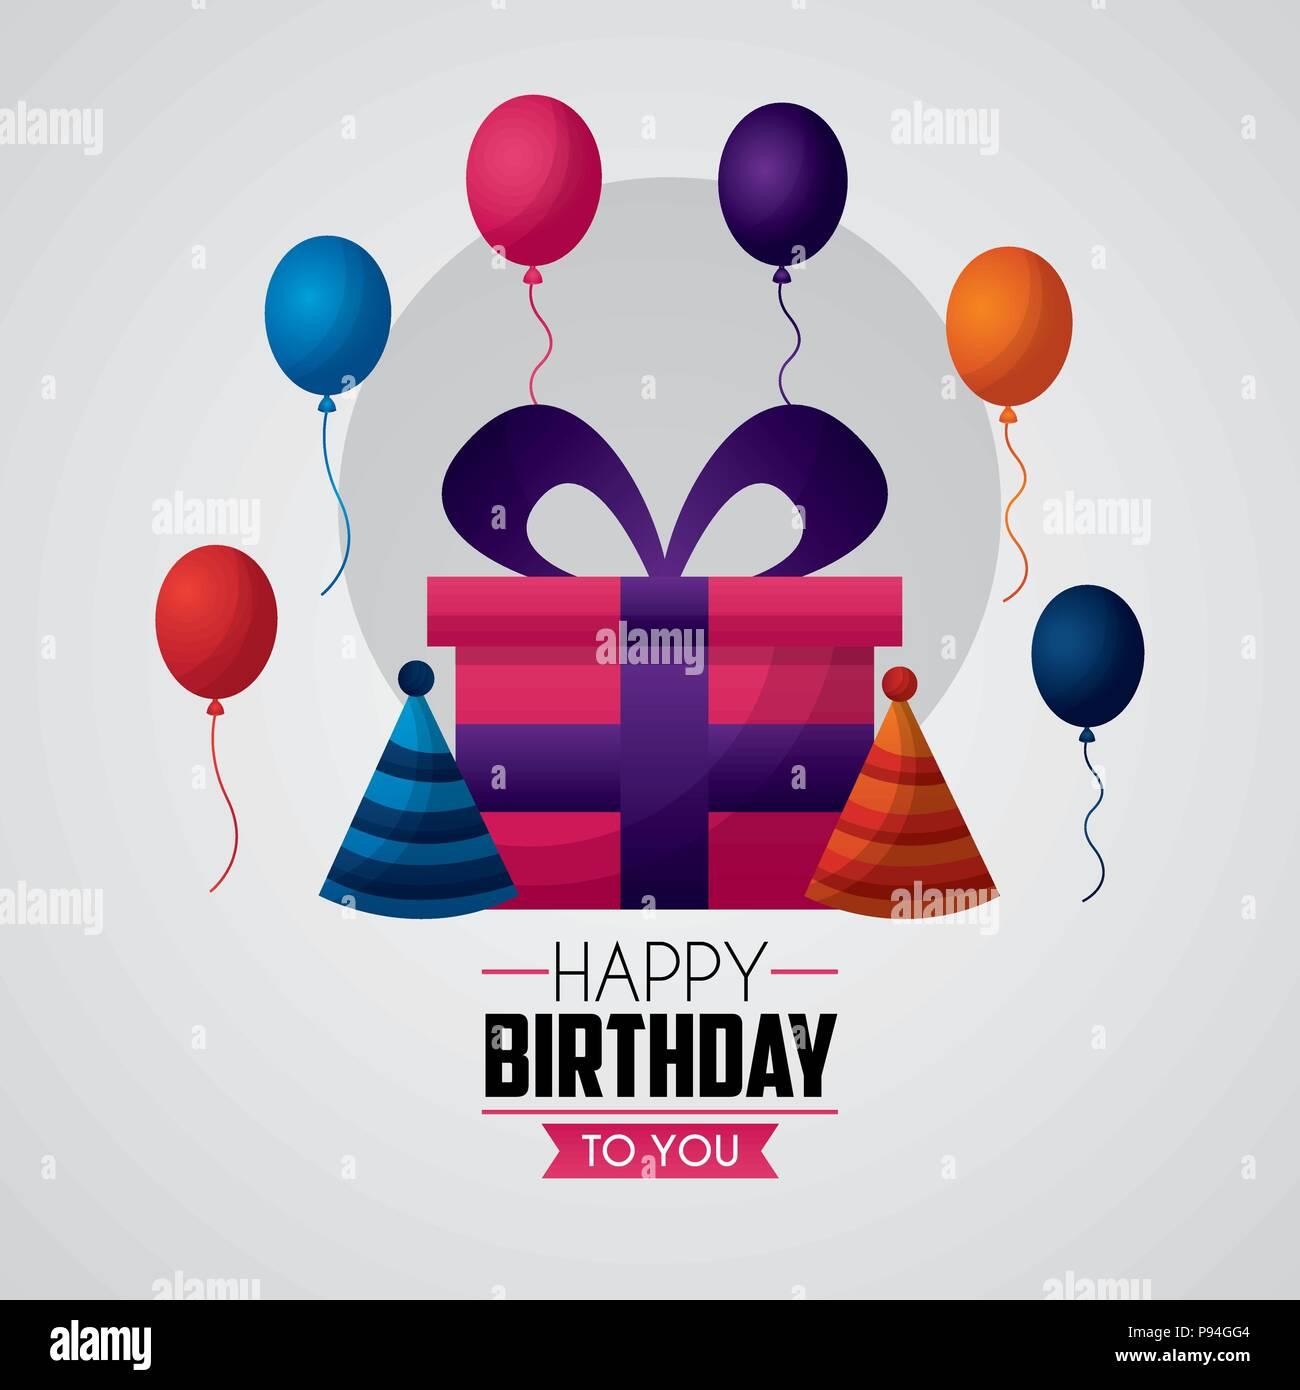 Happy Birthday Card Balloons Gift Box Hats Vector Illustration